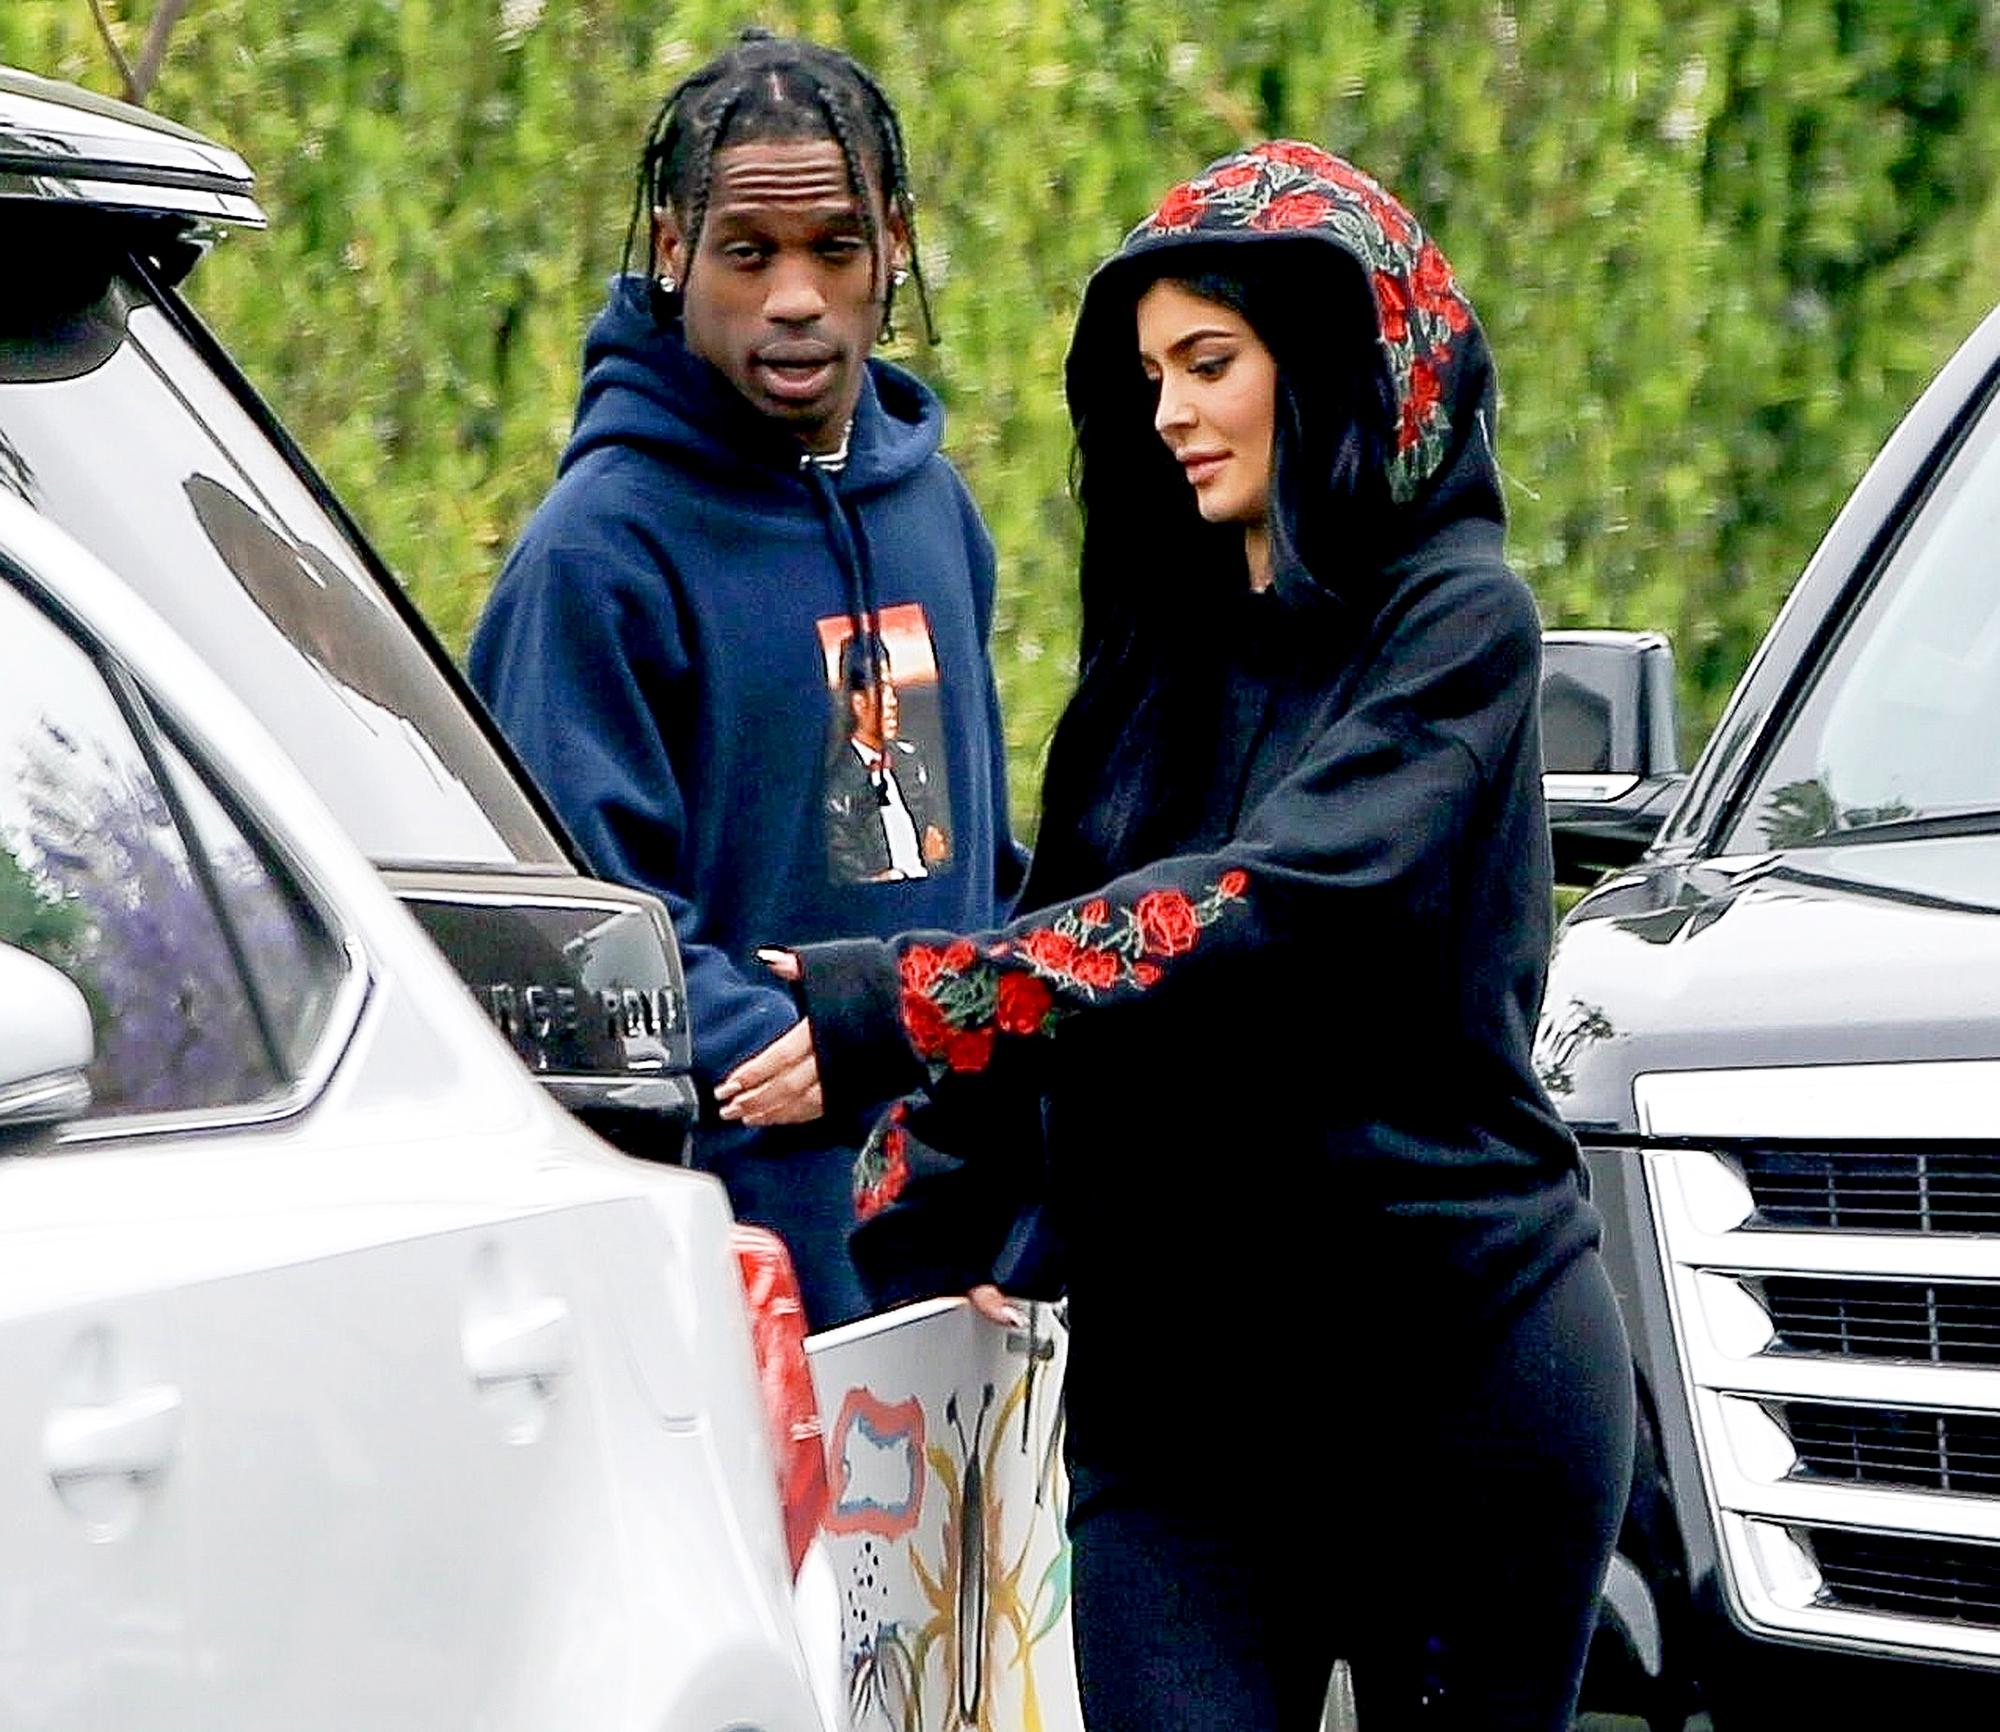 Kylie Jenner Is Wearing Travis Scotts Initials on Her Wedding Finger